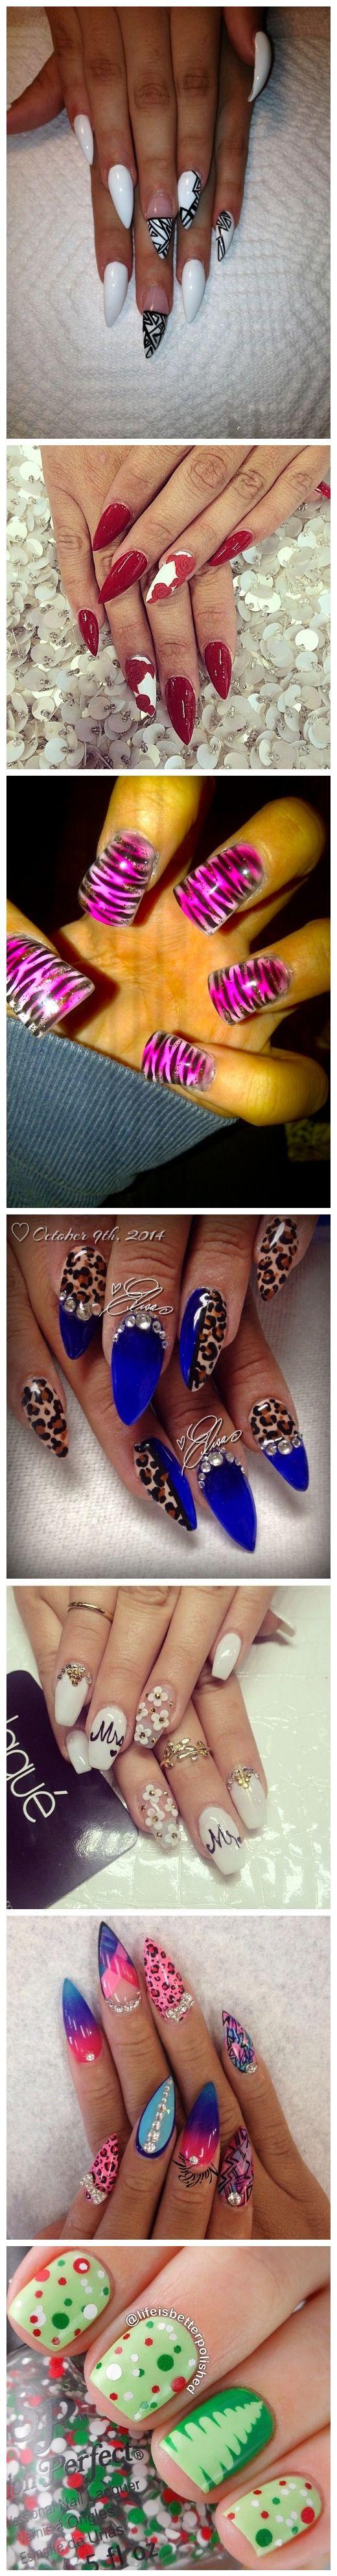 Diy Nail Art | Nails | Pinterest | Nagelschere, Nagellack und ...